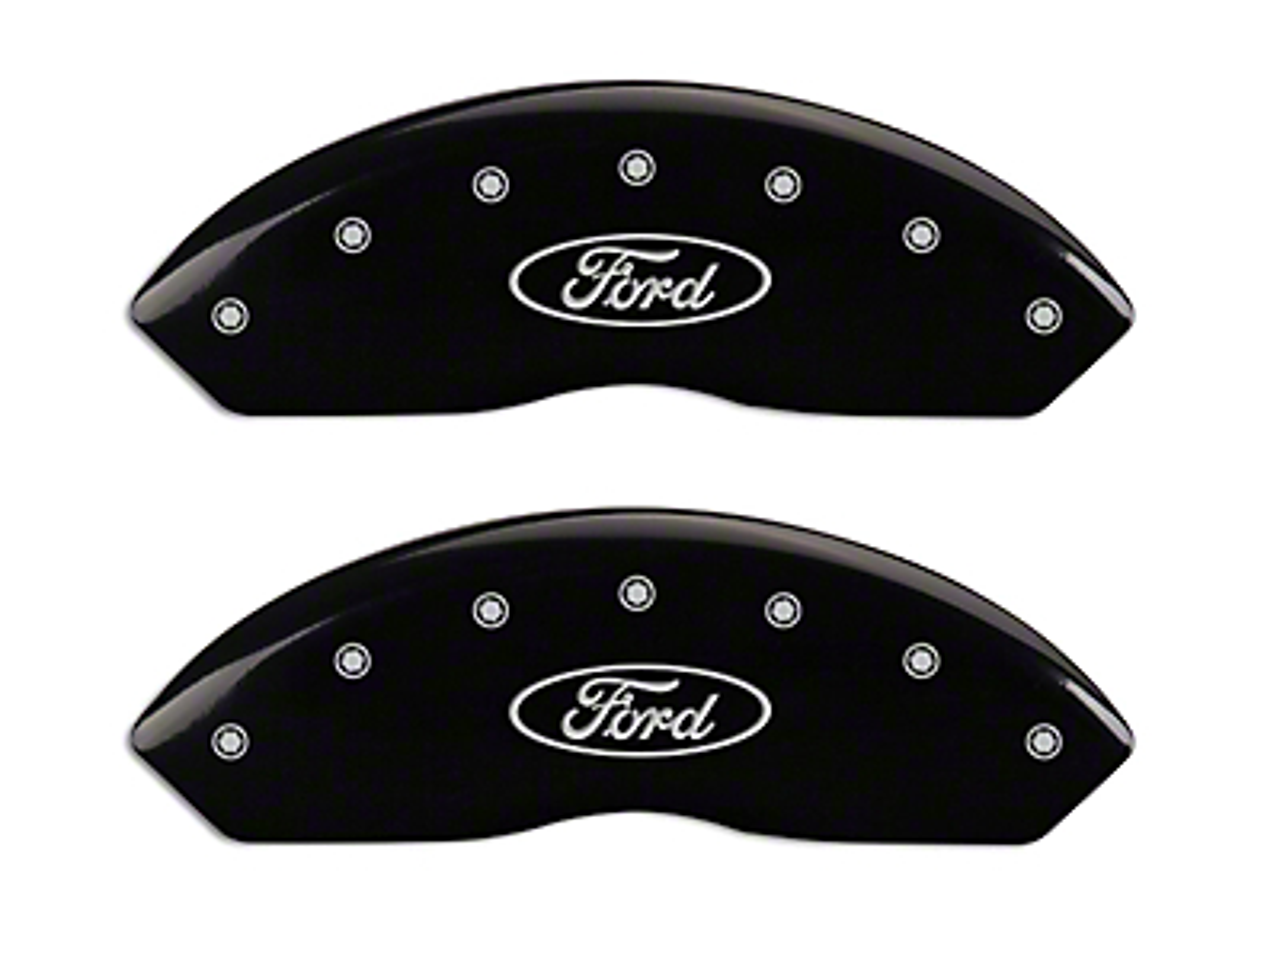 MGP Black Caliper Covers w/ Ford Oval Logo - Front & Rear (97-03 F-150)